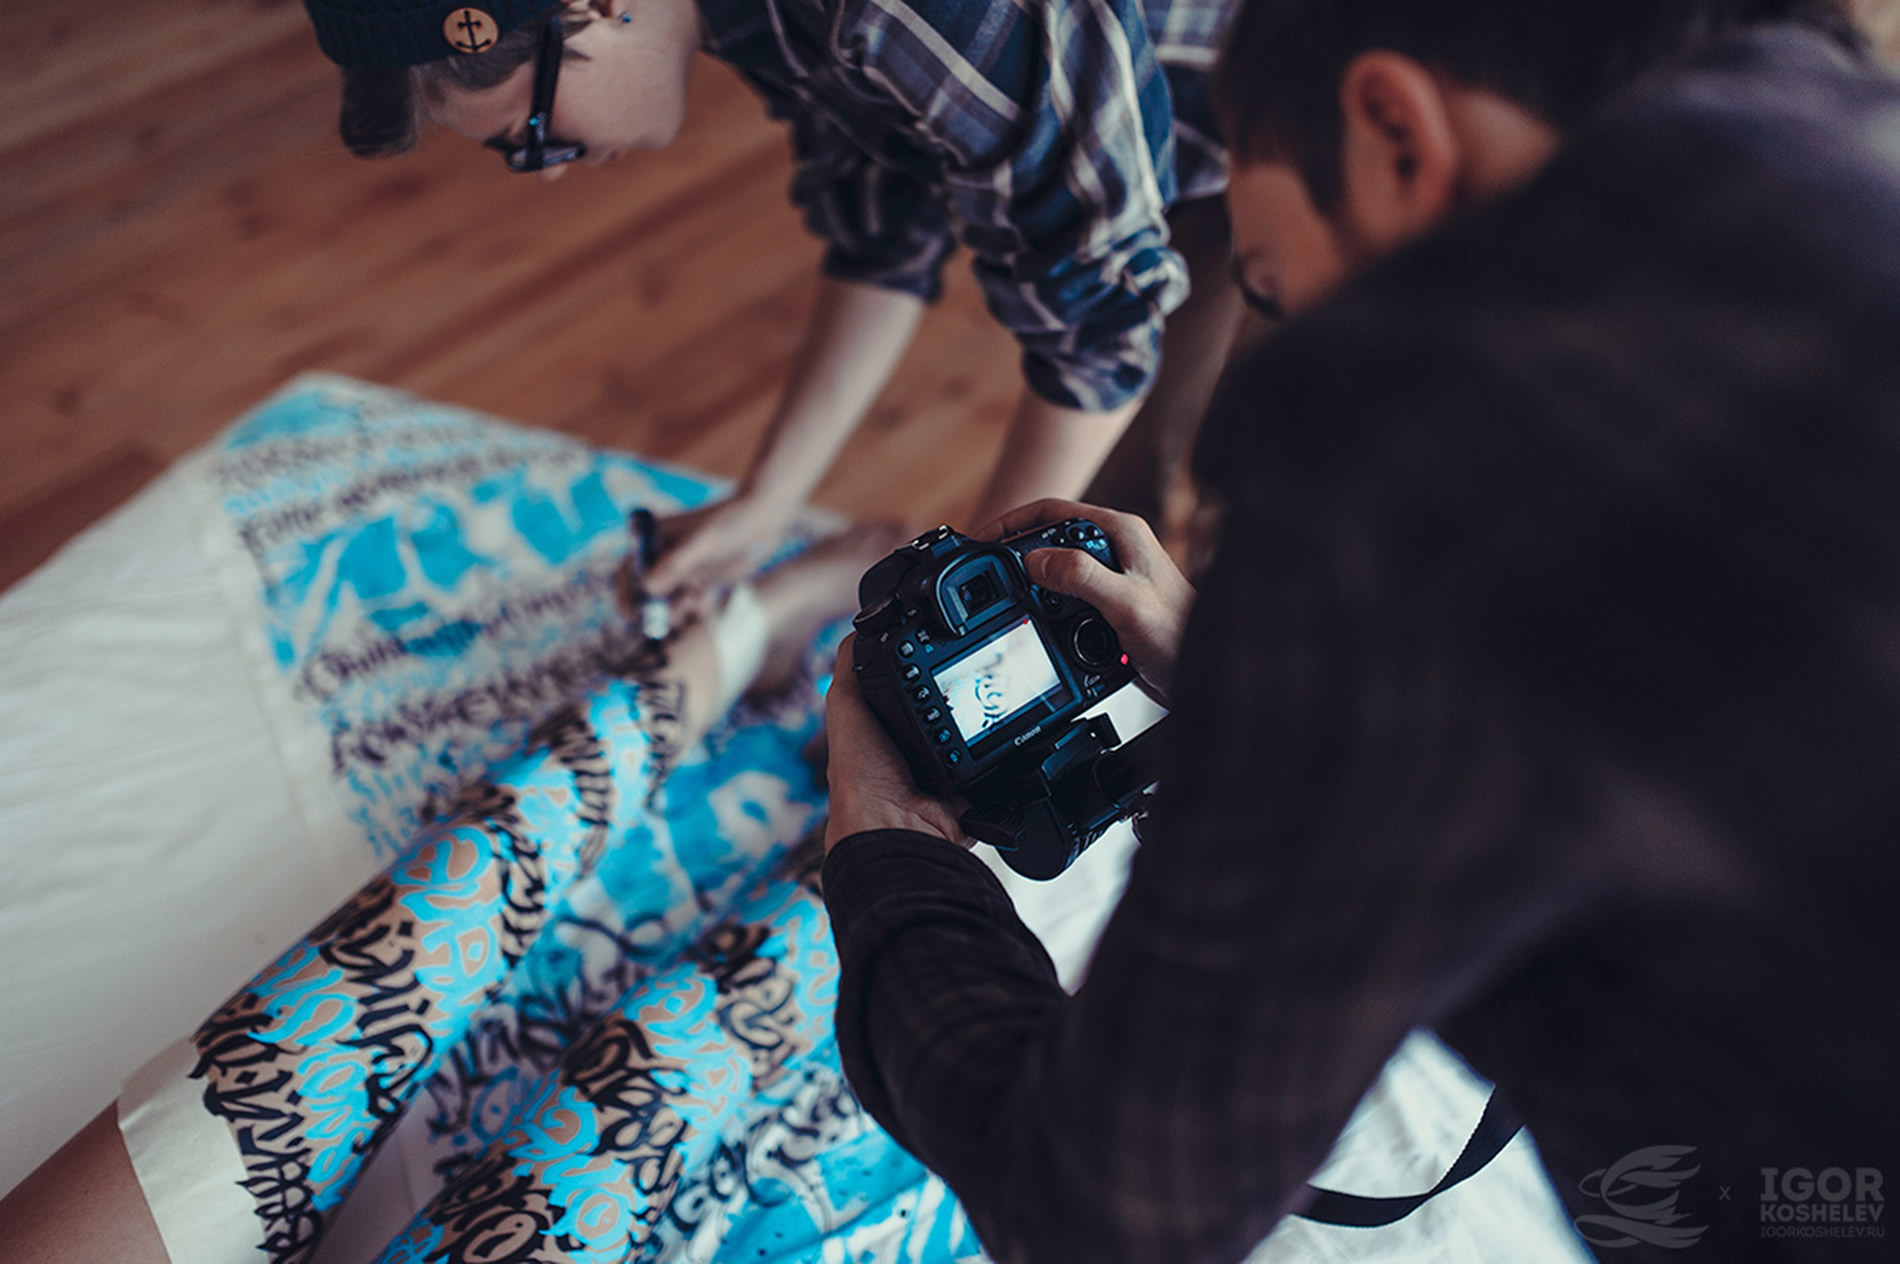 Каллиграфия Покраса Лампаса на теле обнажённых девушек